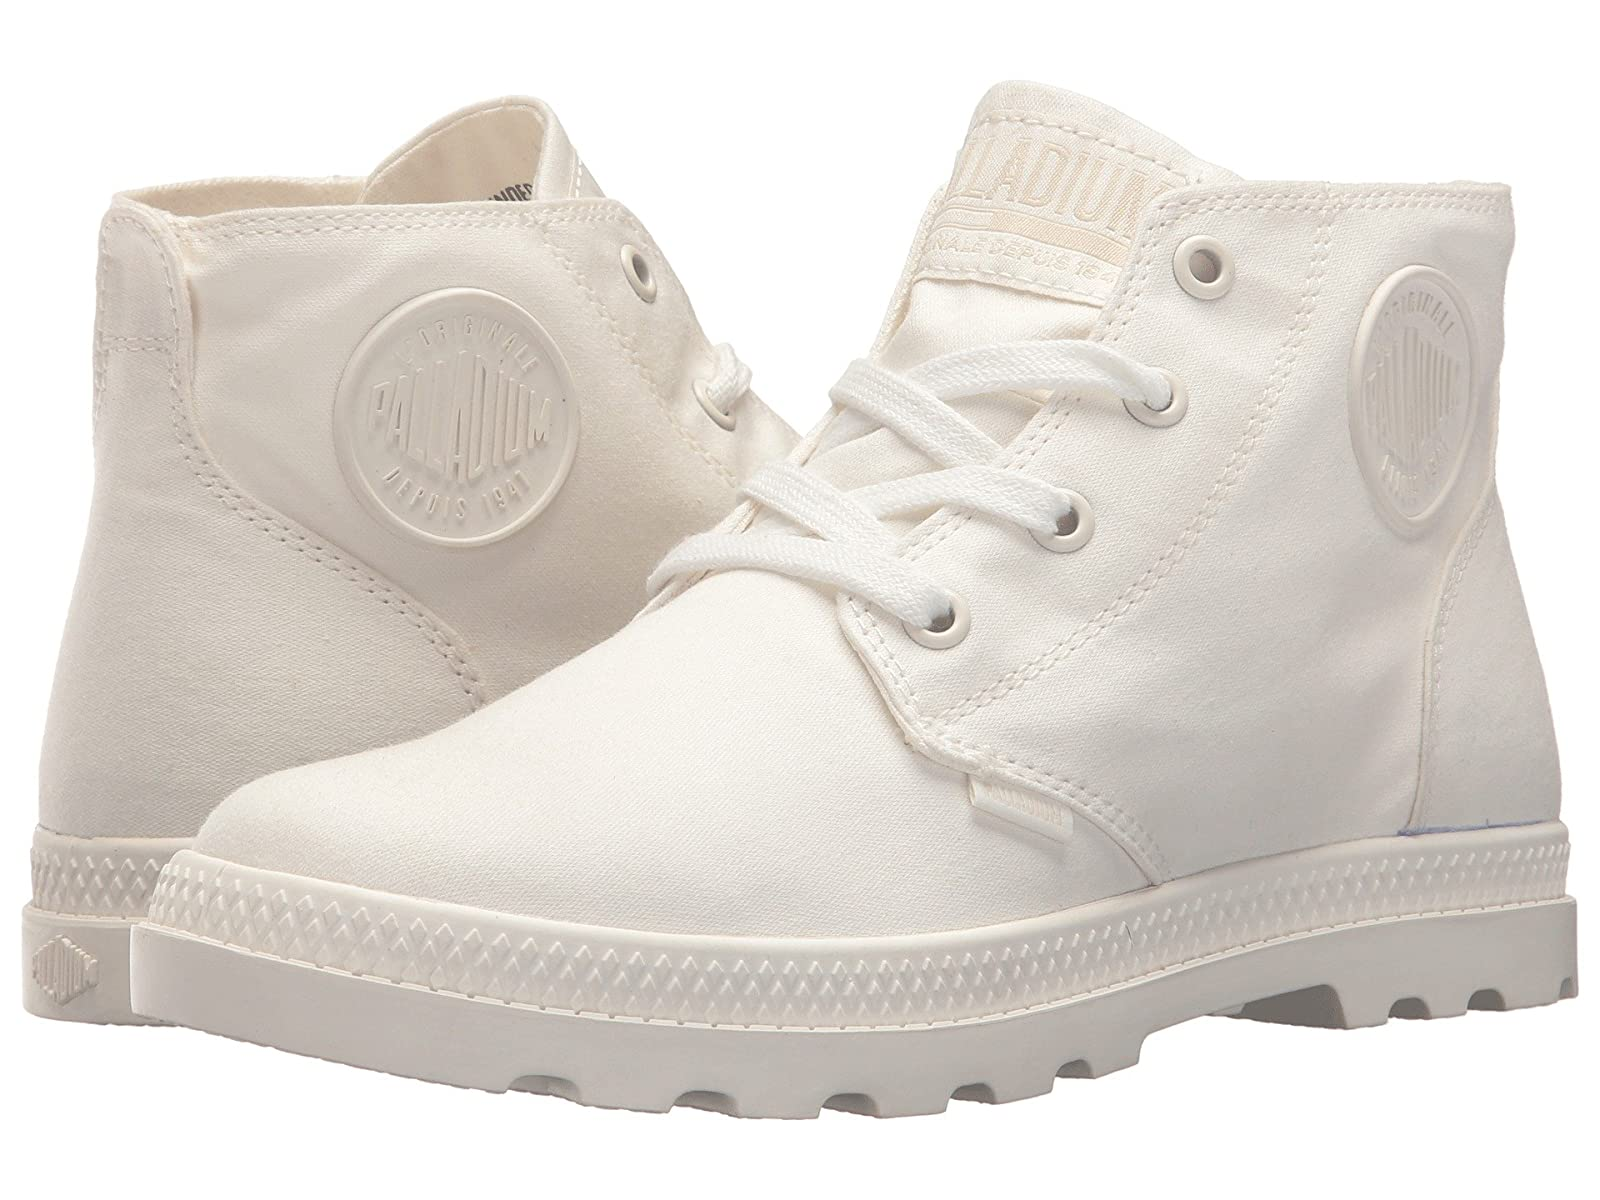 Palladium Pampa Free CVSAtmospheric grades have affordable shoes